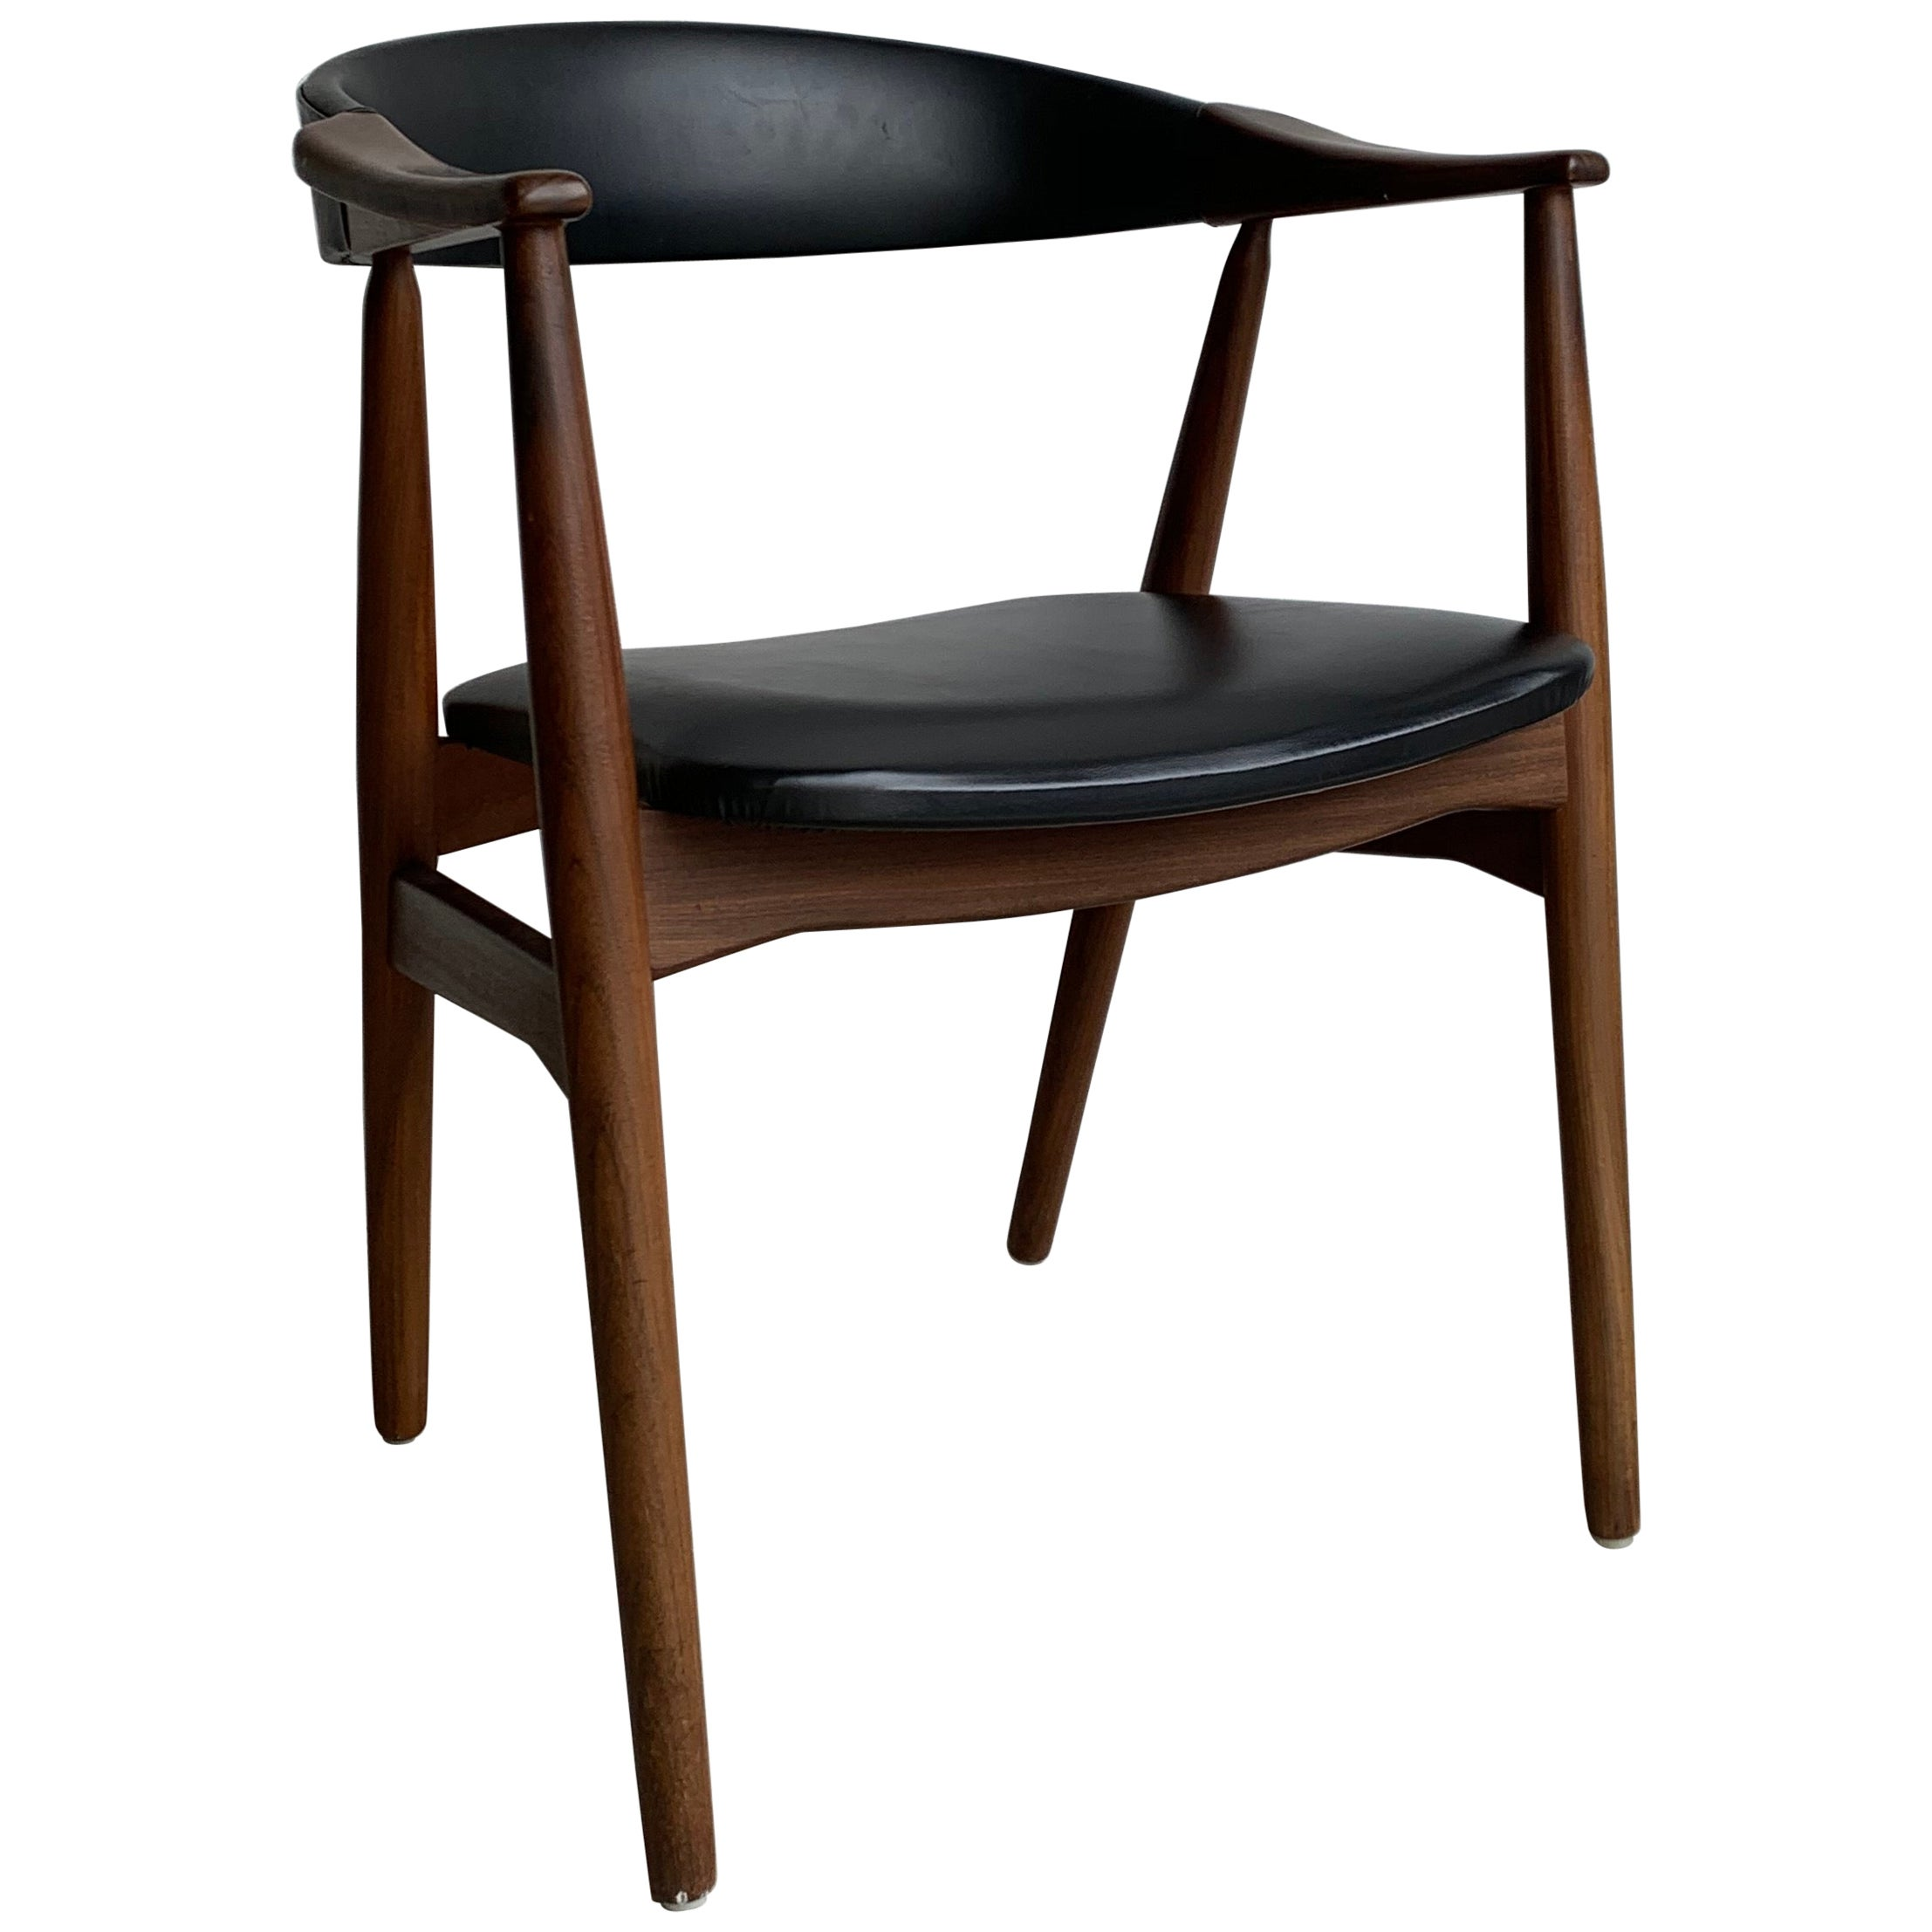 20th Century Scandinavian Modern Black Teak Chair from Farstrup Møbler, 1960s